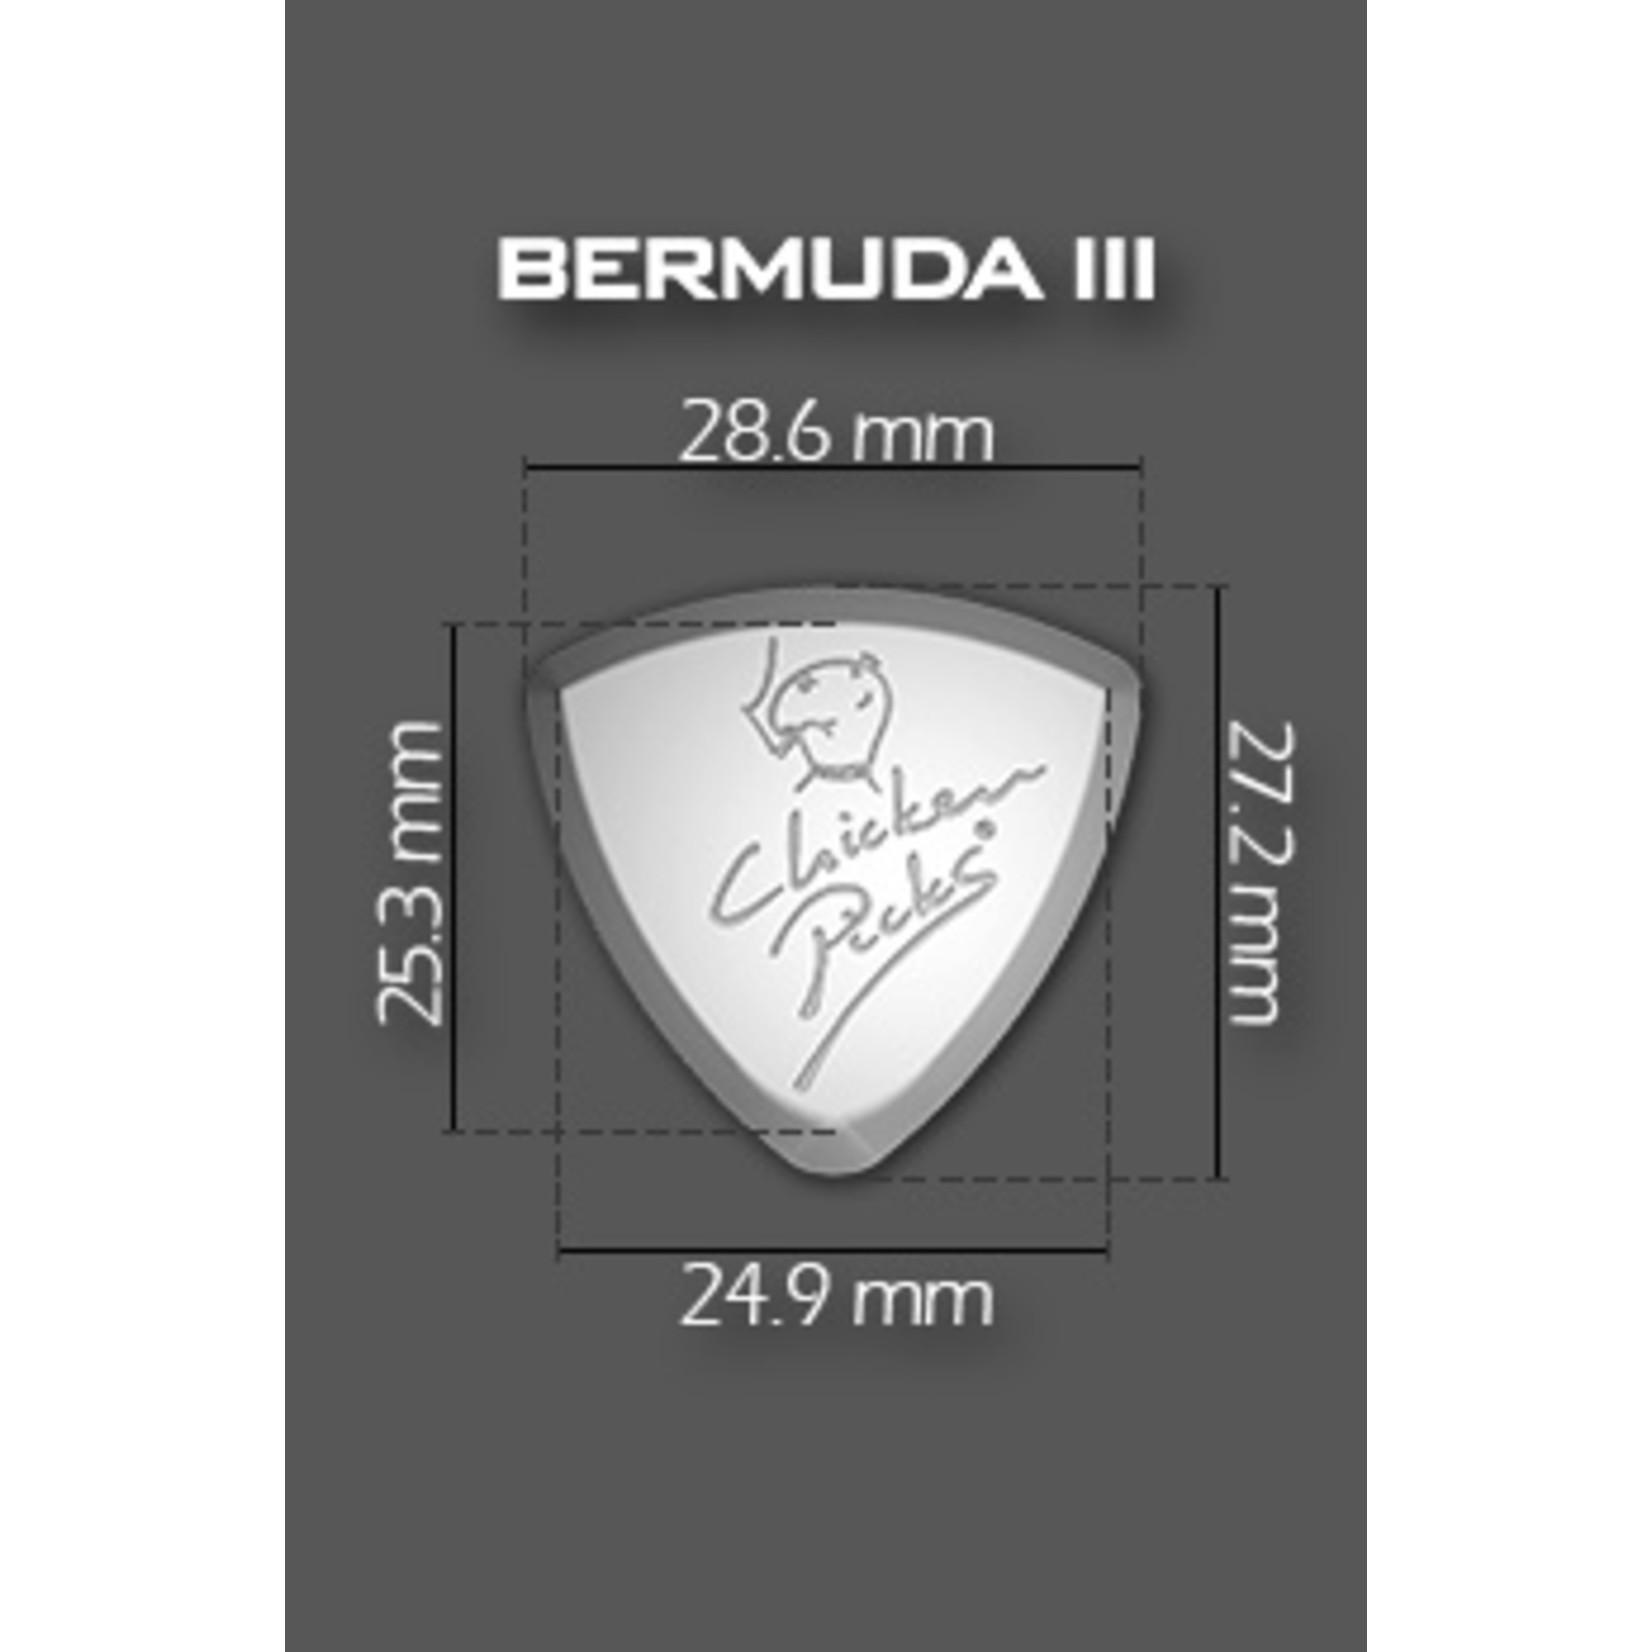 "ChickenPicks Guitar Picks ChickenPicks 1x ""Bermuda III"" 2.7mm - Ultimate tone, performance, control (Chicken Picks)"